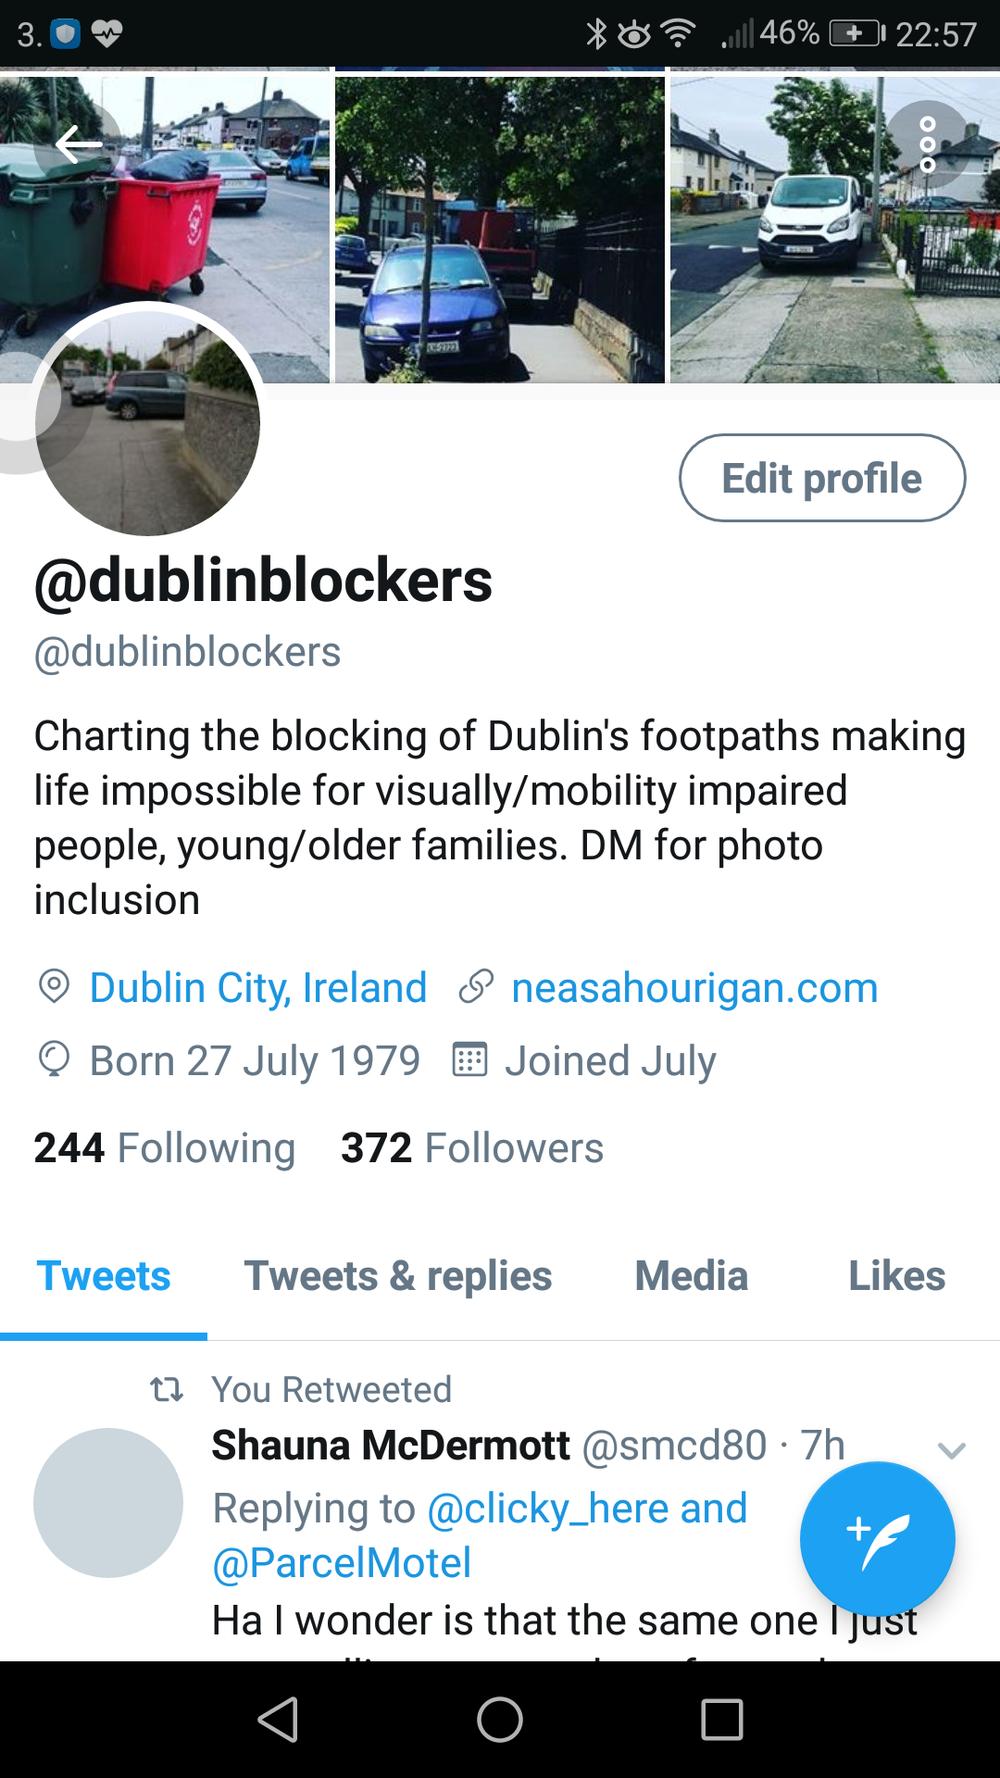 Twitter page of Dublin Blockers